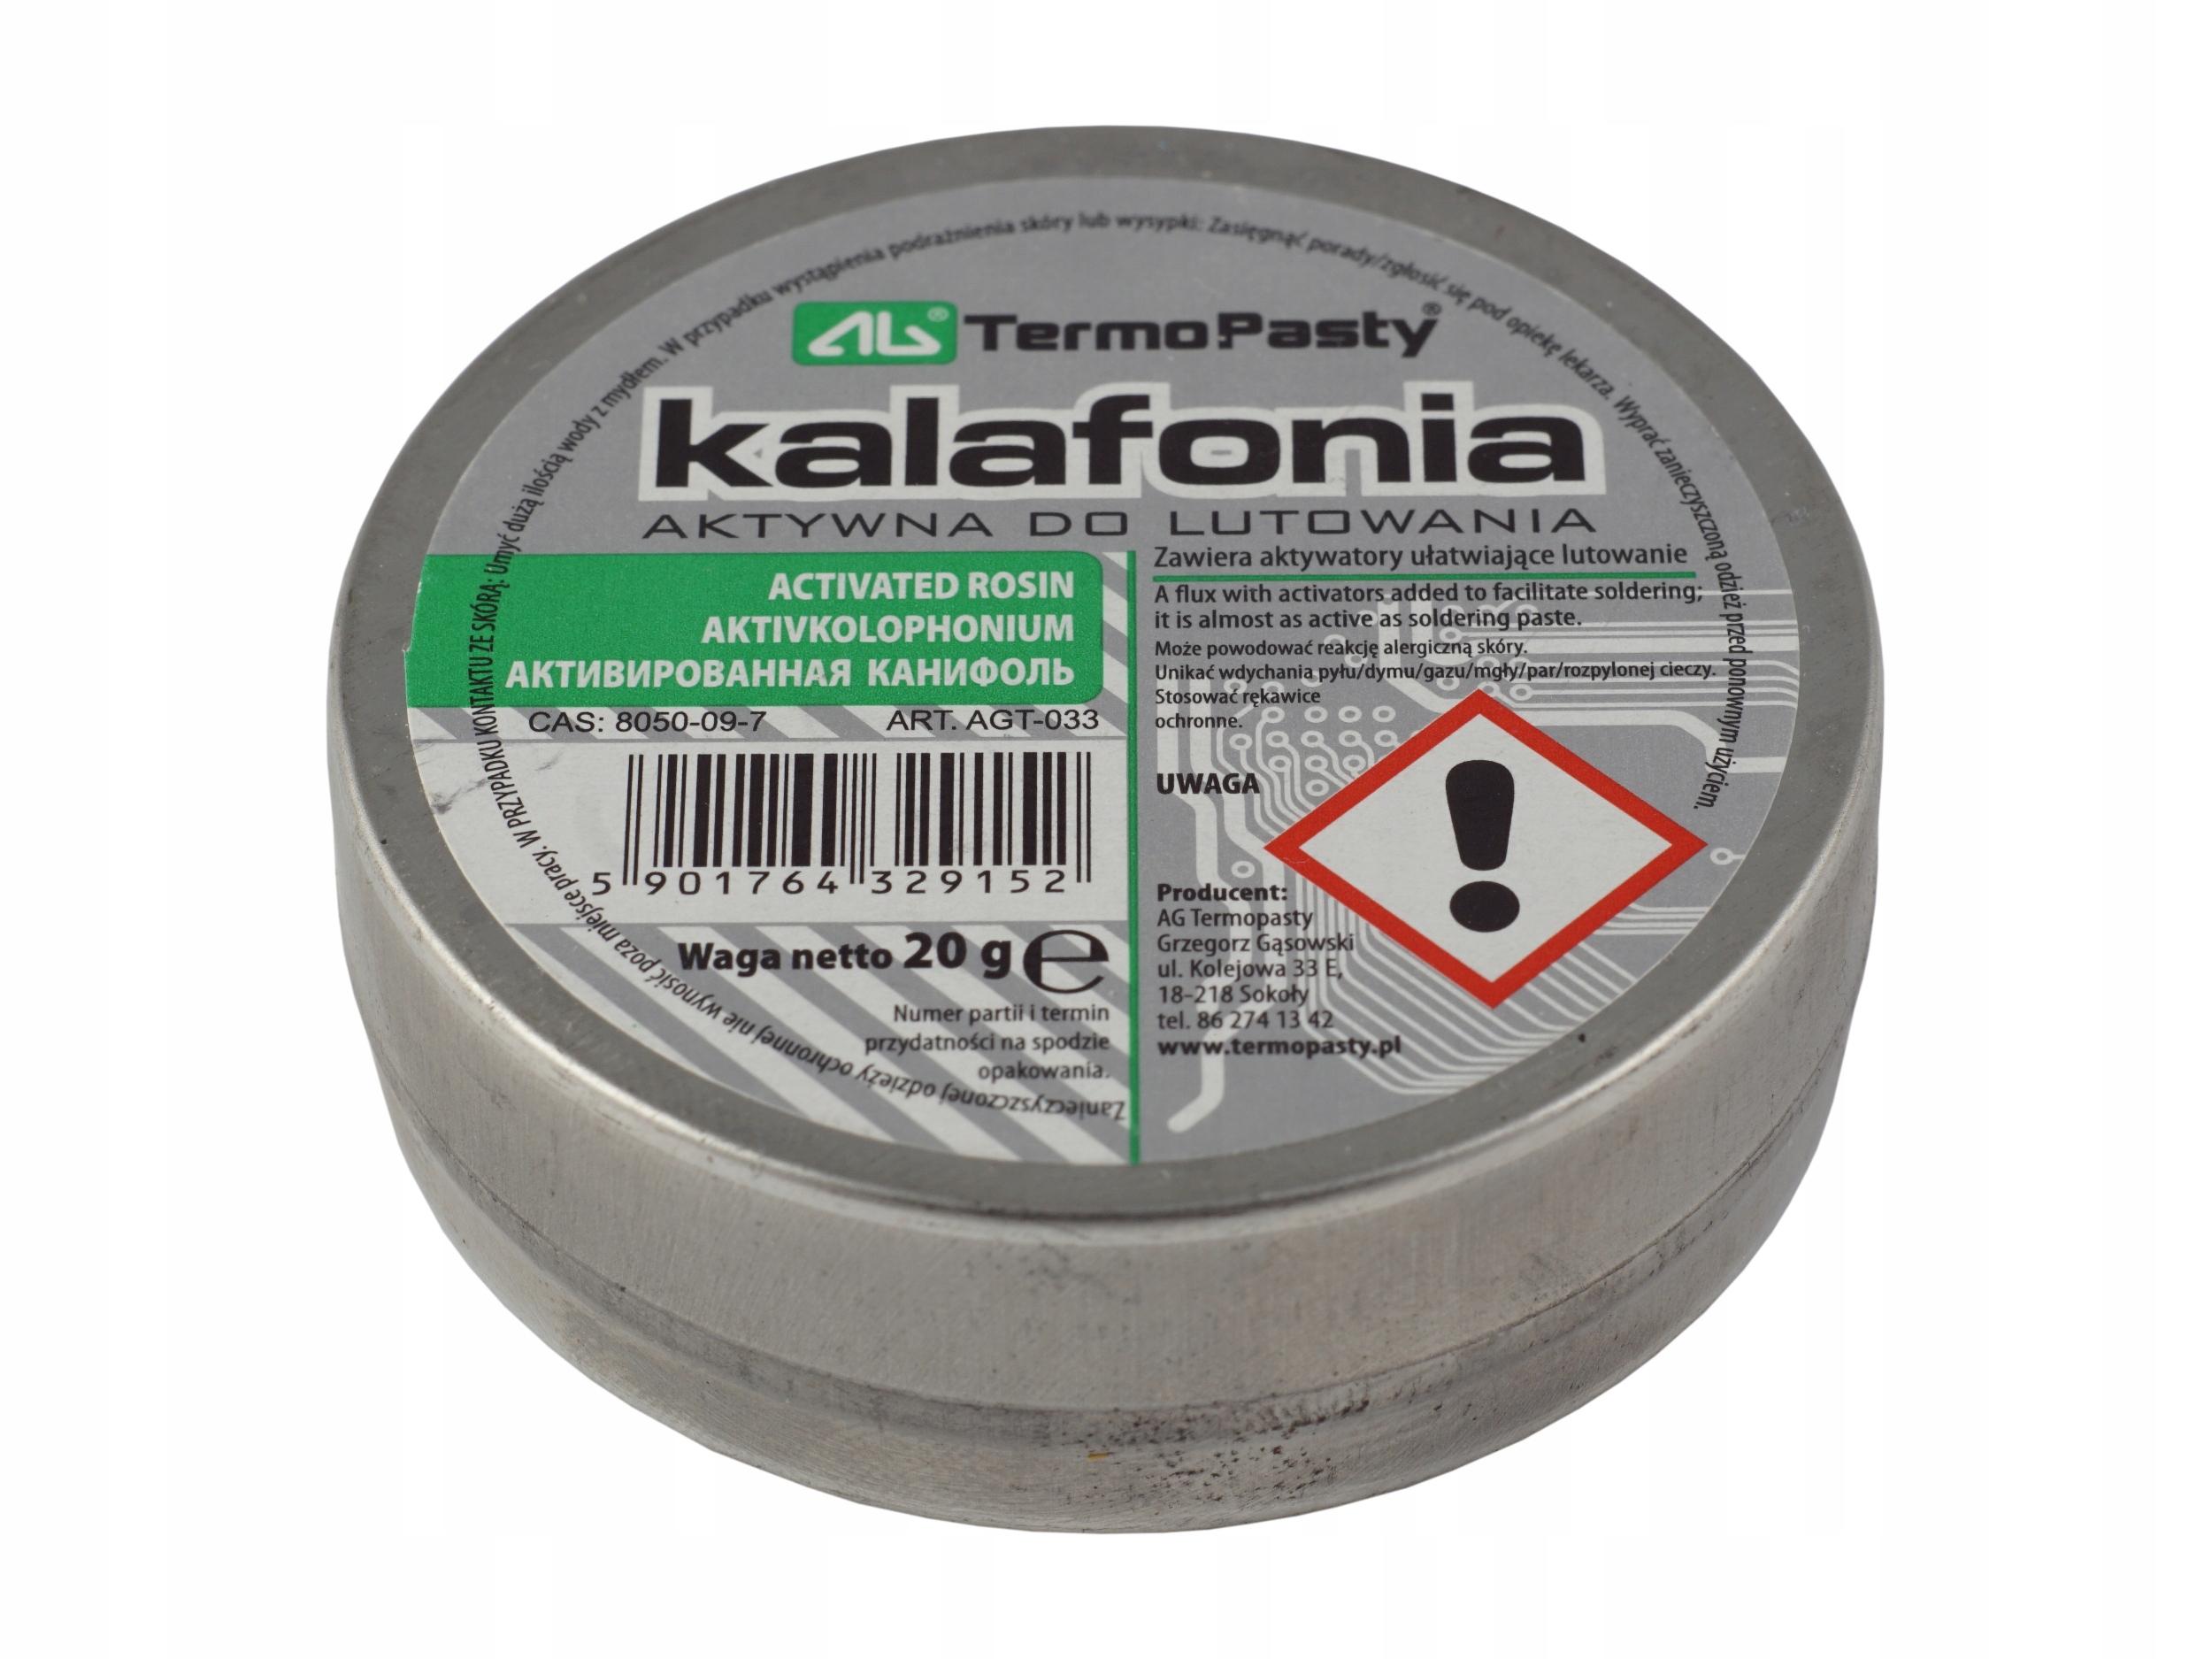 Kalafonia 20g